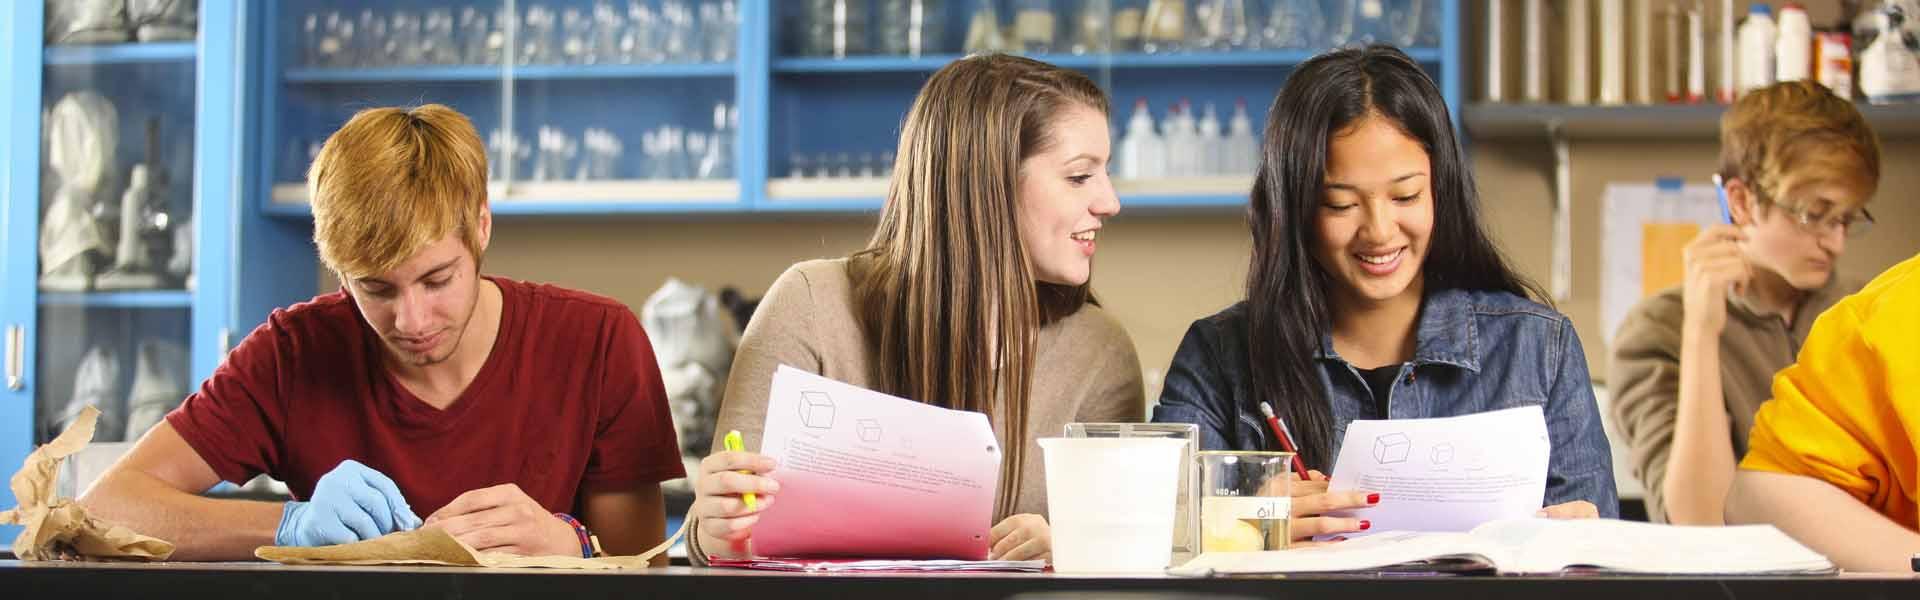 Girls in Class at Scottsburg High School in Indiana USA